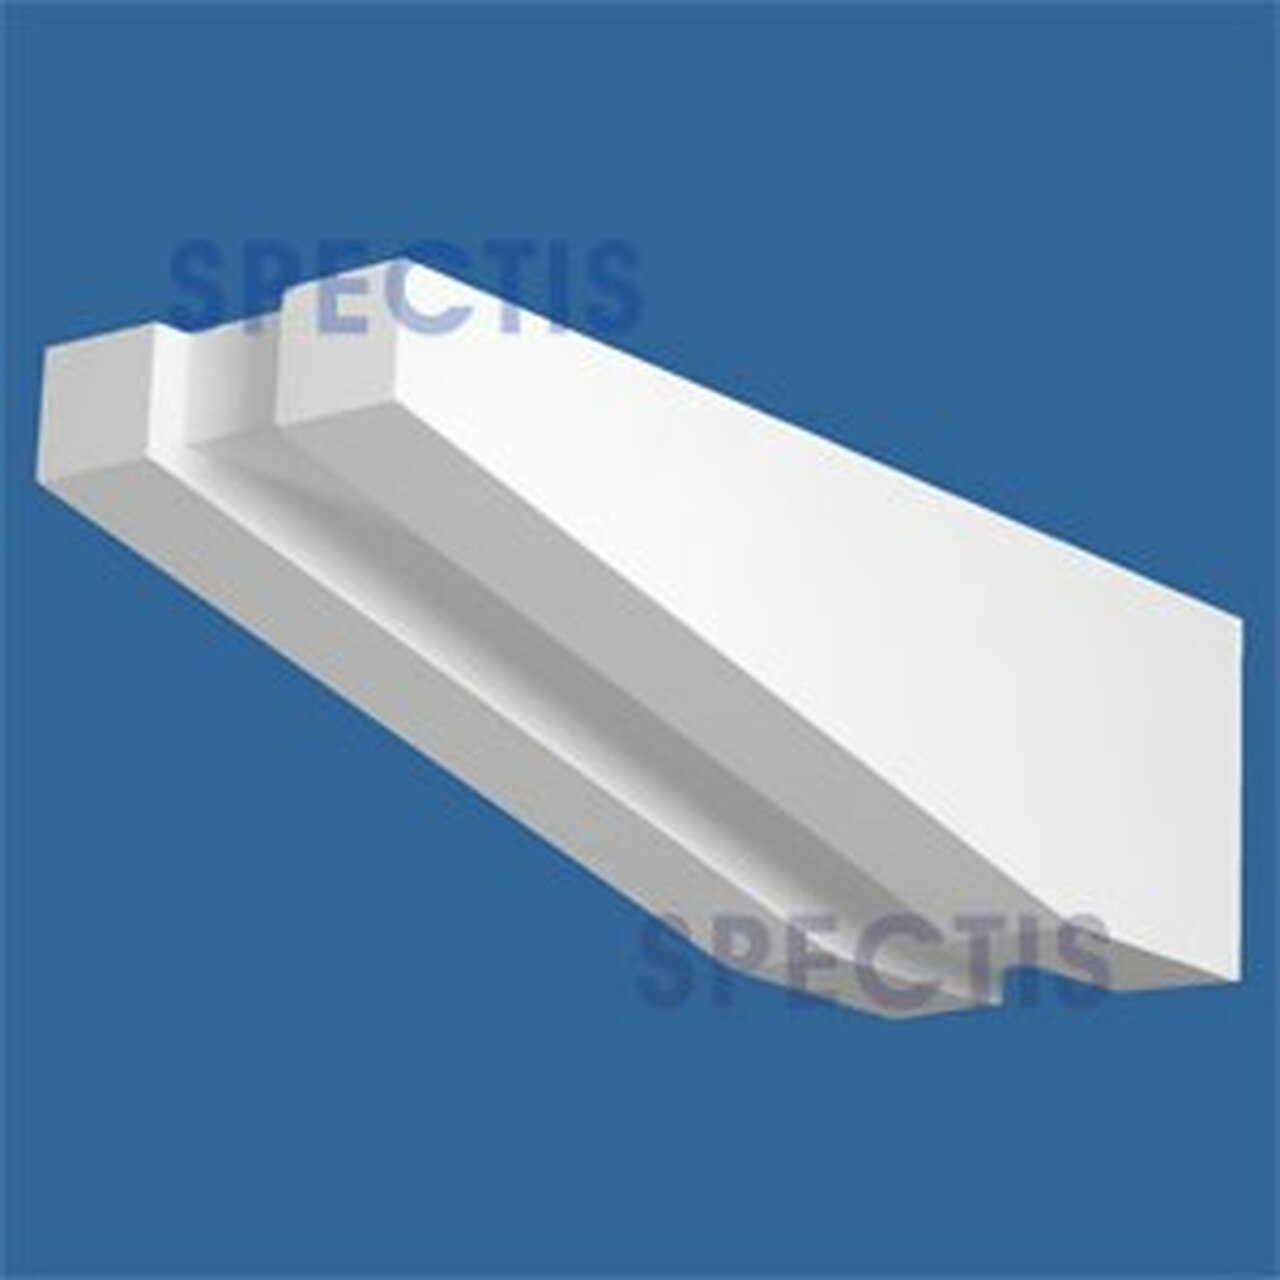 "BL2778 Corbel Block or Eave Bracket 10.5""W x 9.25""H x 31"" P"